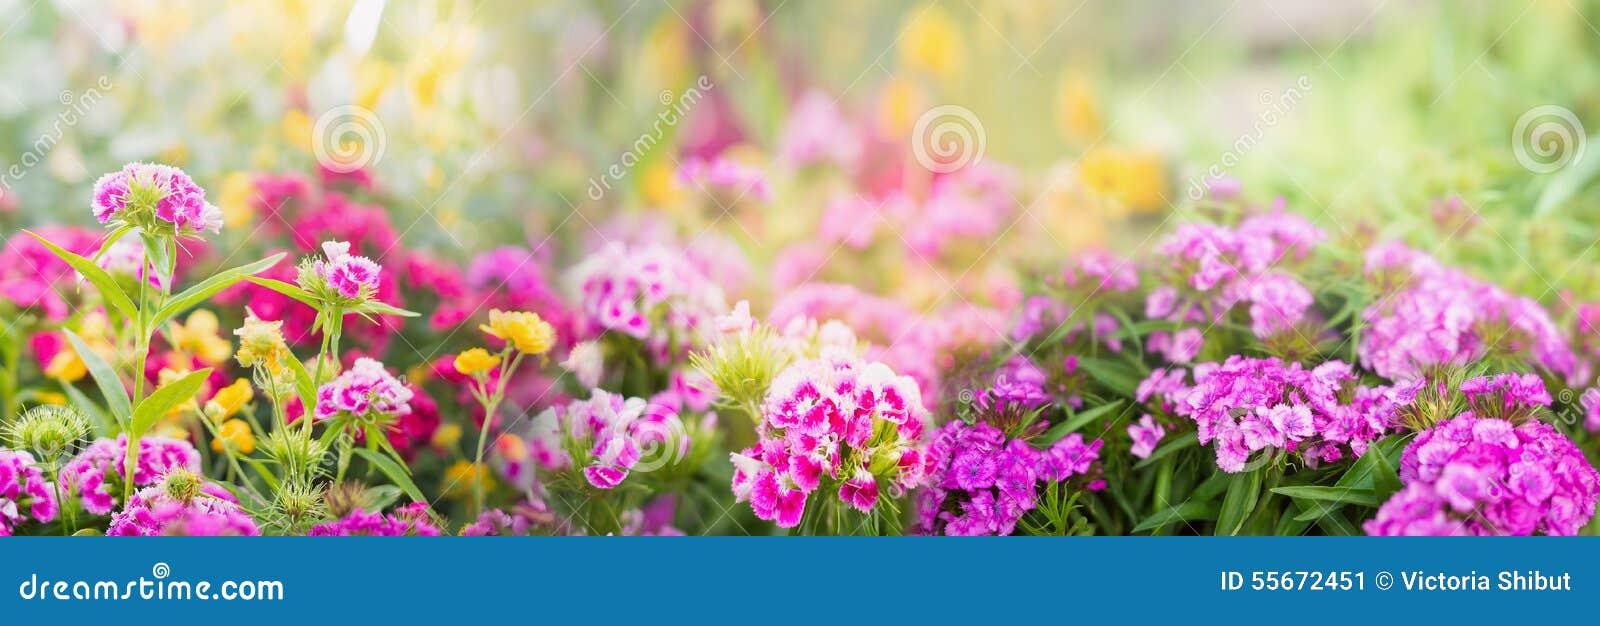 Dianthus flowers on blurred summer garden or park background, banner